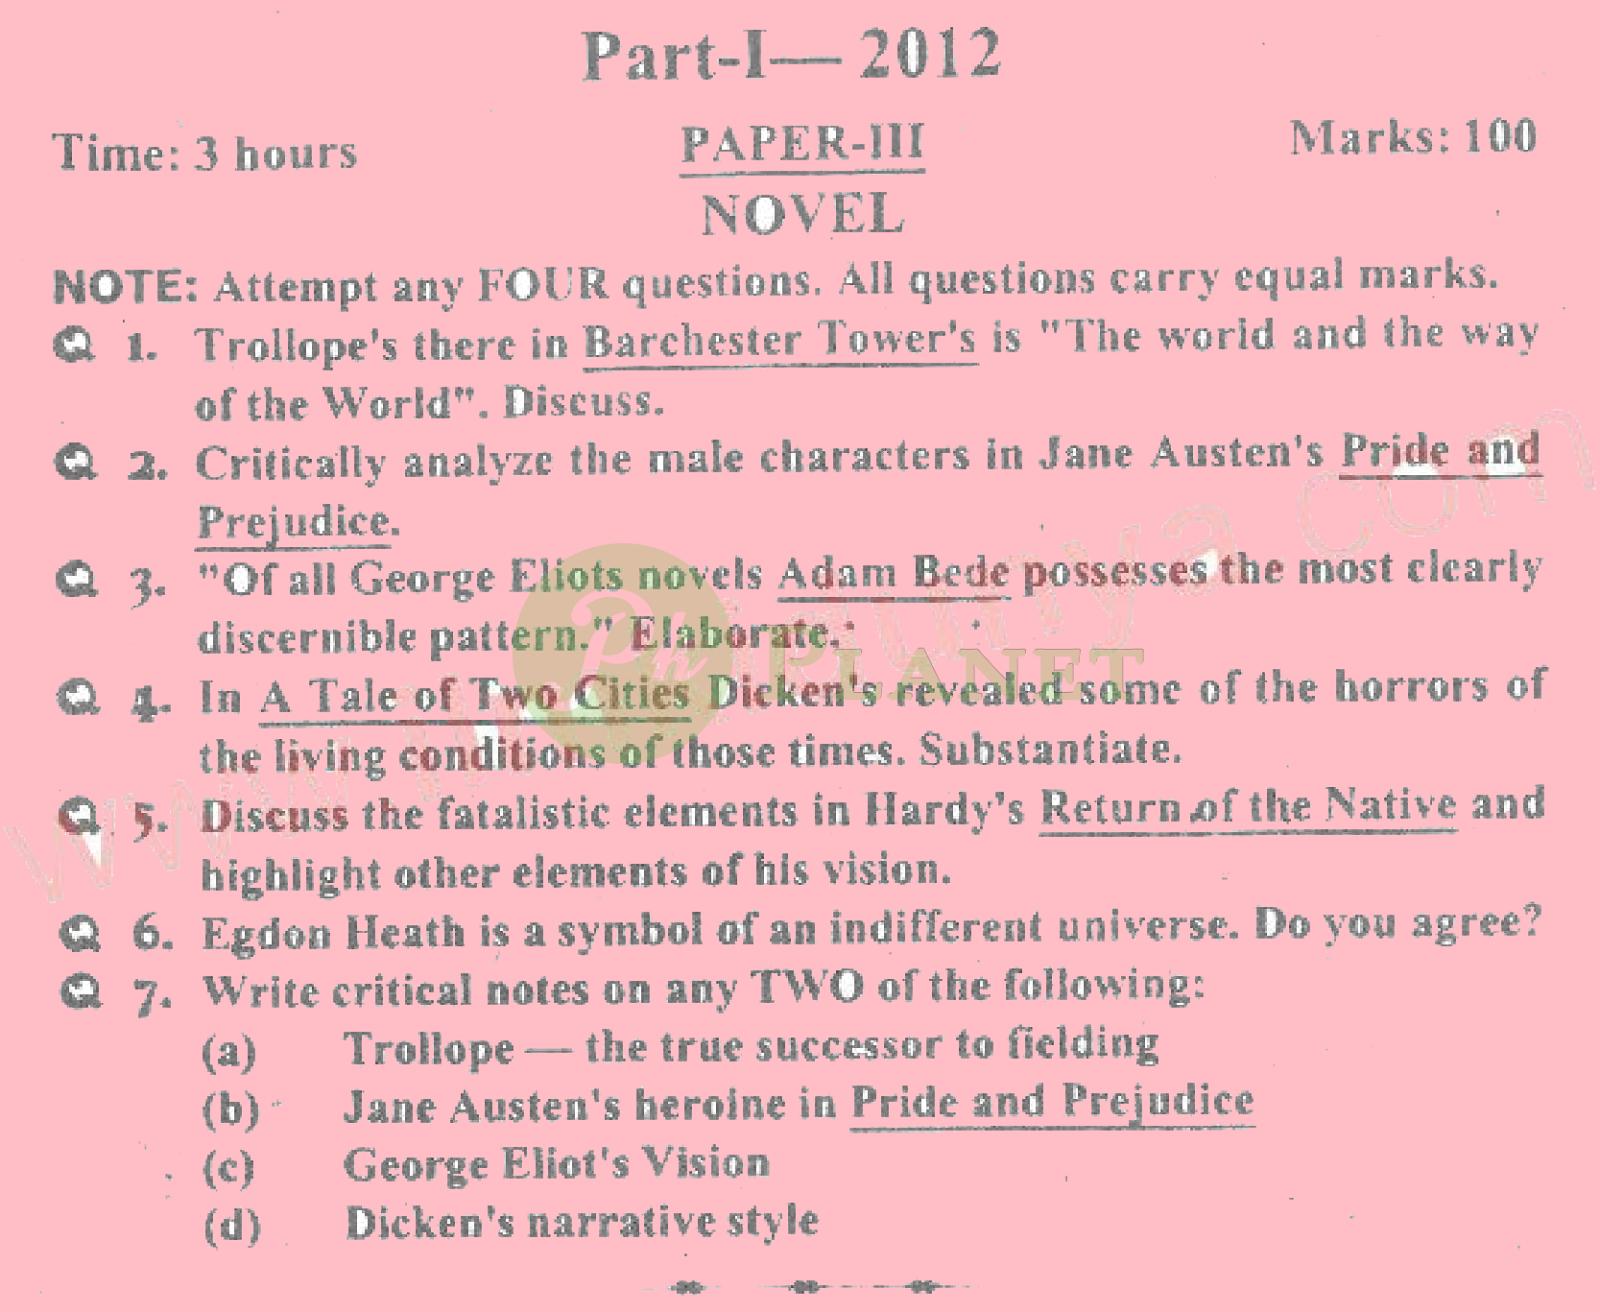 ma english part 1 past papers punjab university 2012 novel